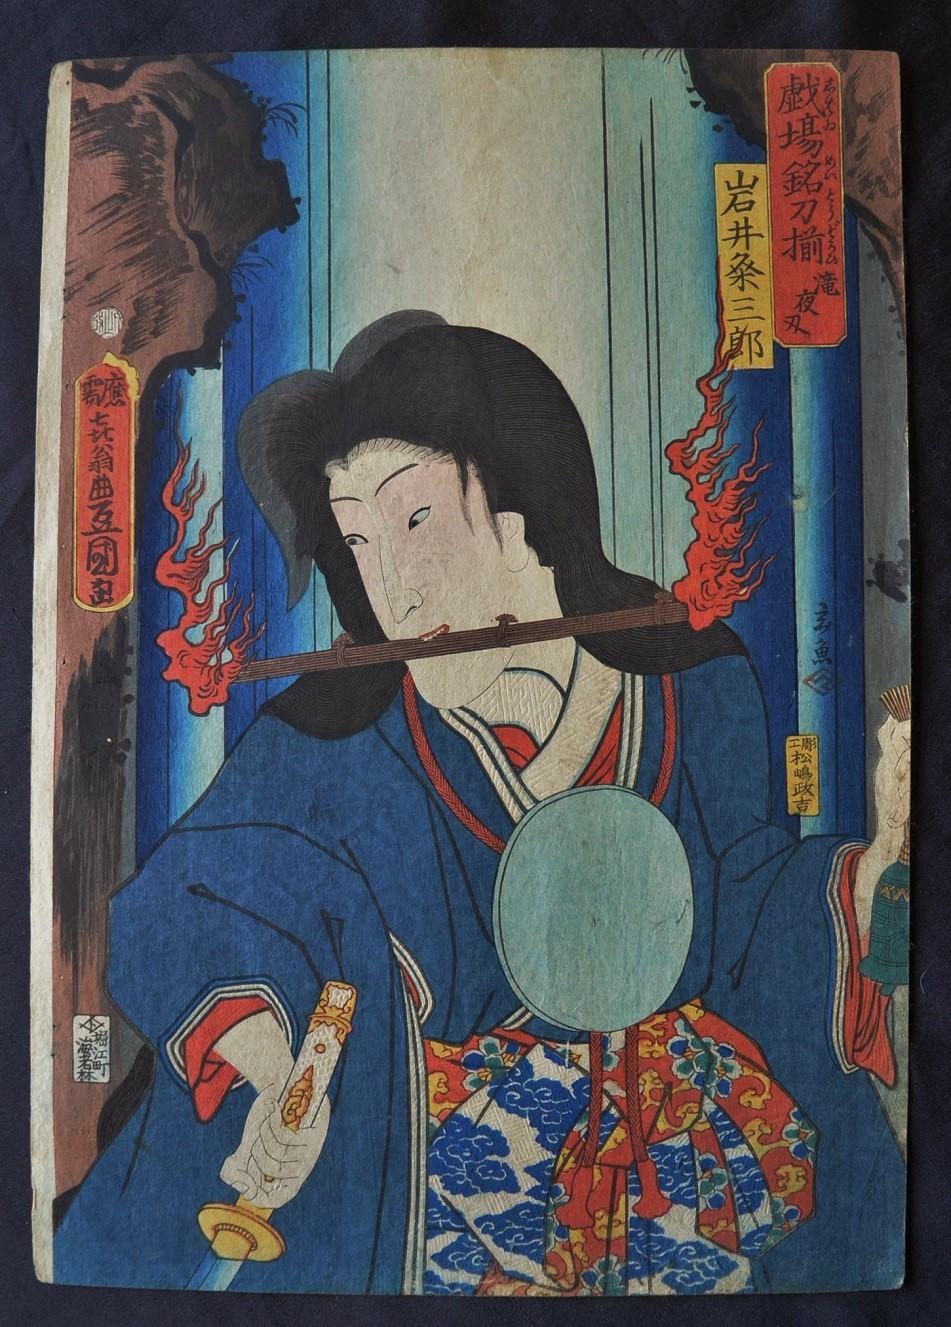 UTAGAWA KUNISADA: #P4395 WOMAN WARRIOR DATED 1853